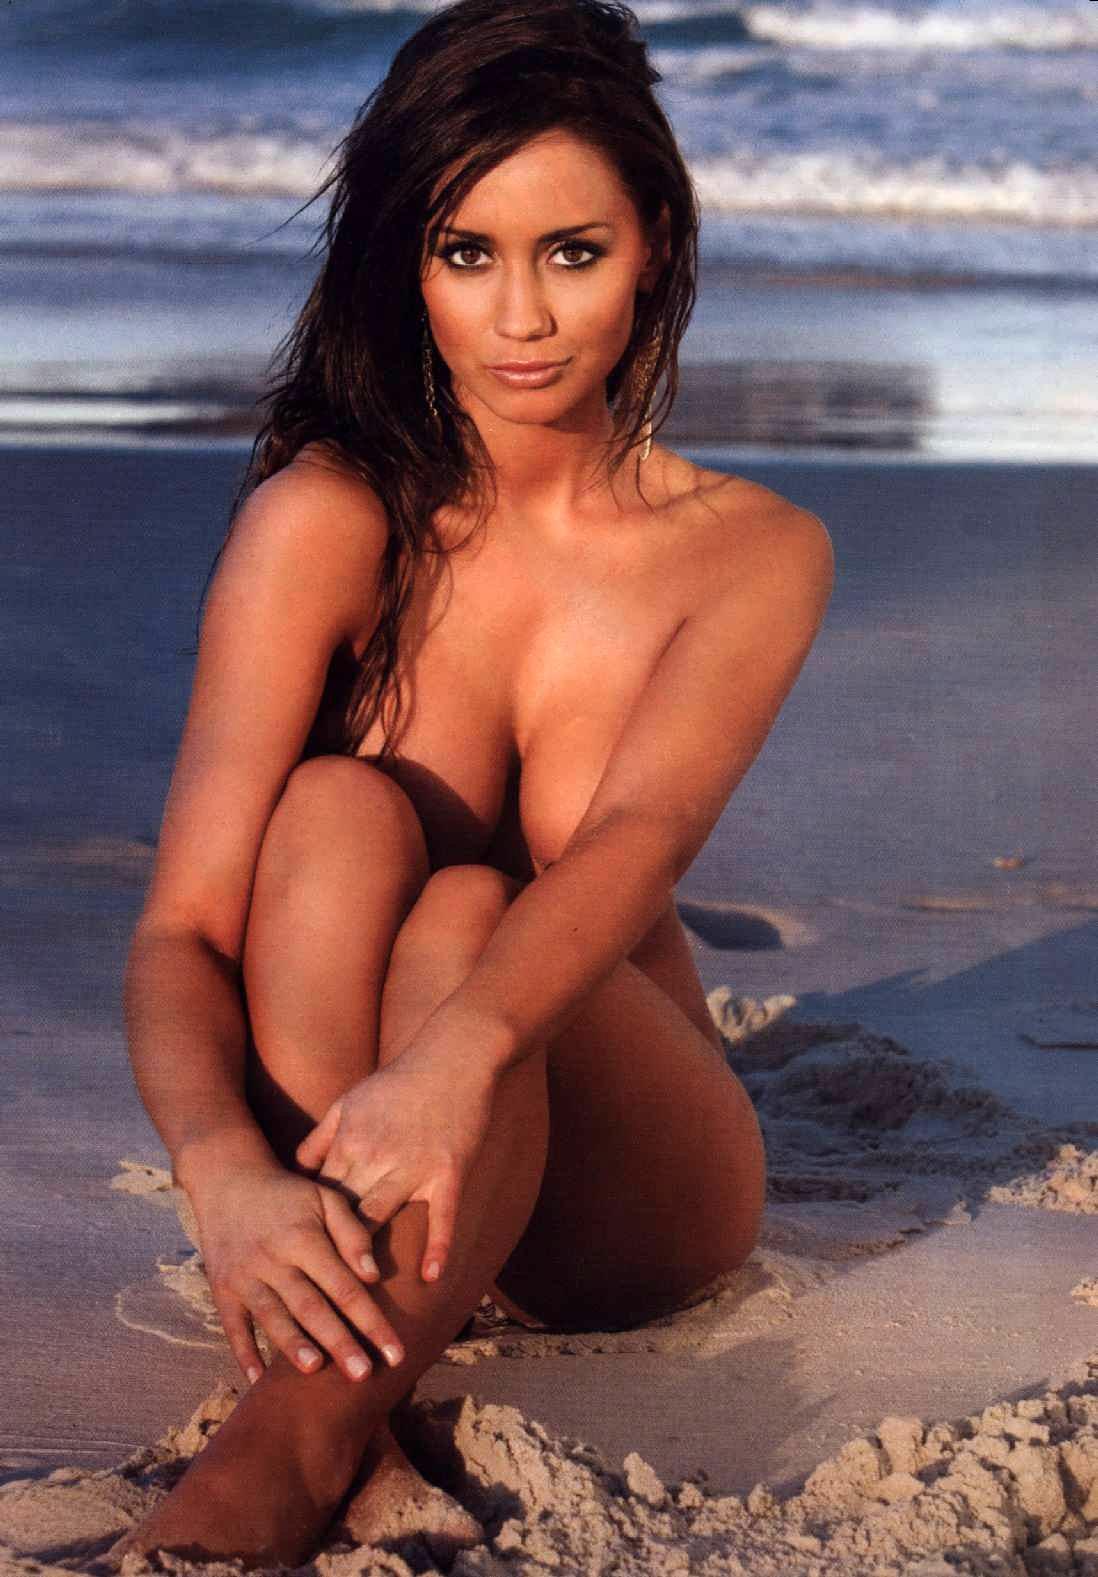 Krystal Forscutt Sexy Wet Bikini Wallpaper Wallpapers